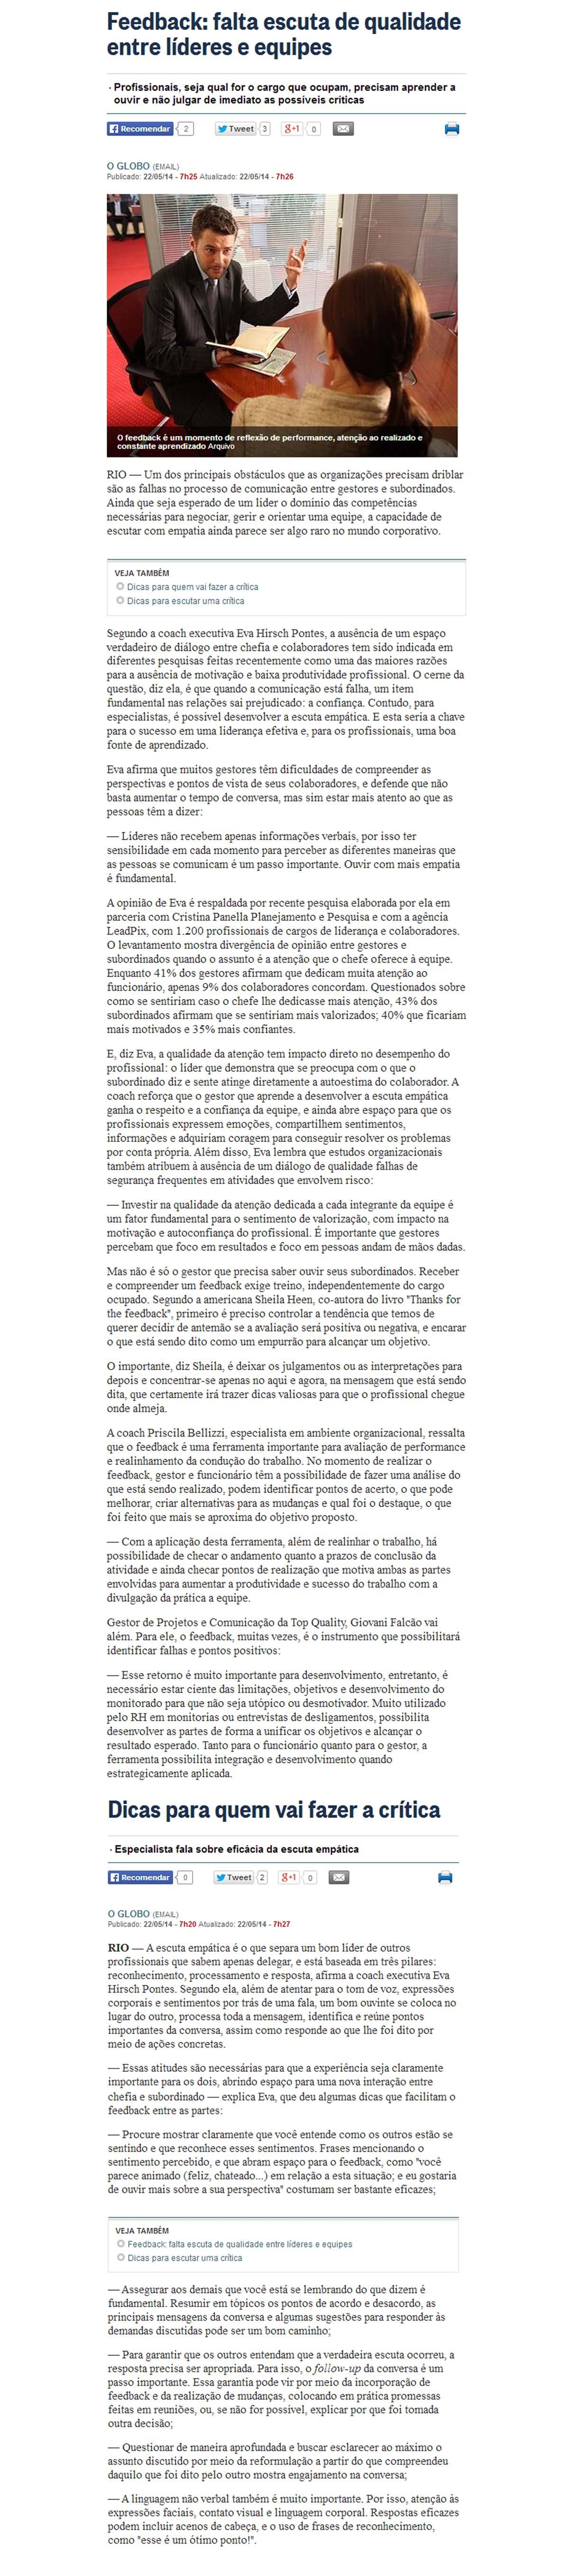 "Matéria ""Falta escuta de qualidade entre líderes e equipes"" | 22 de maio de 2014"